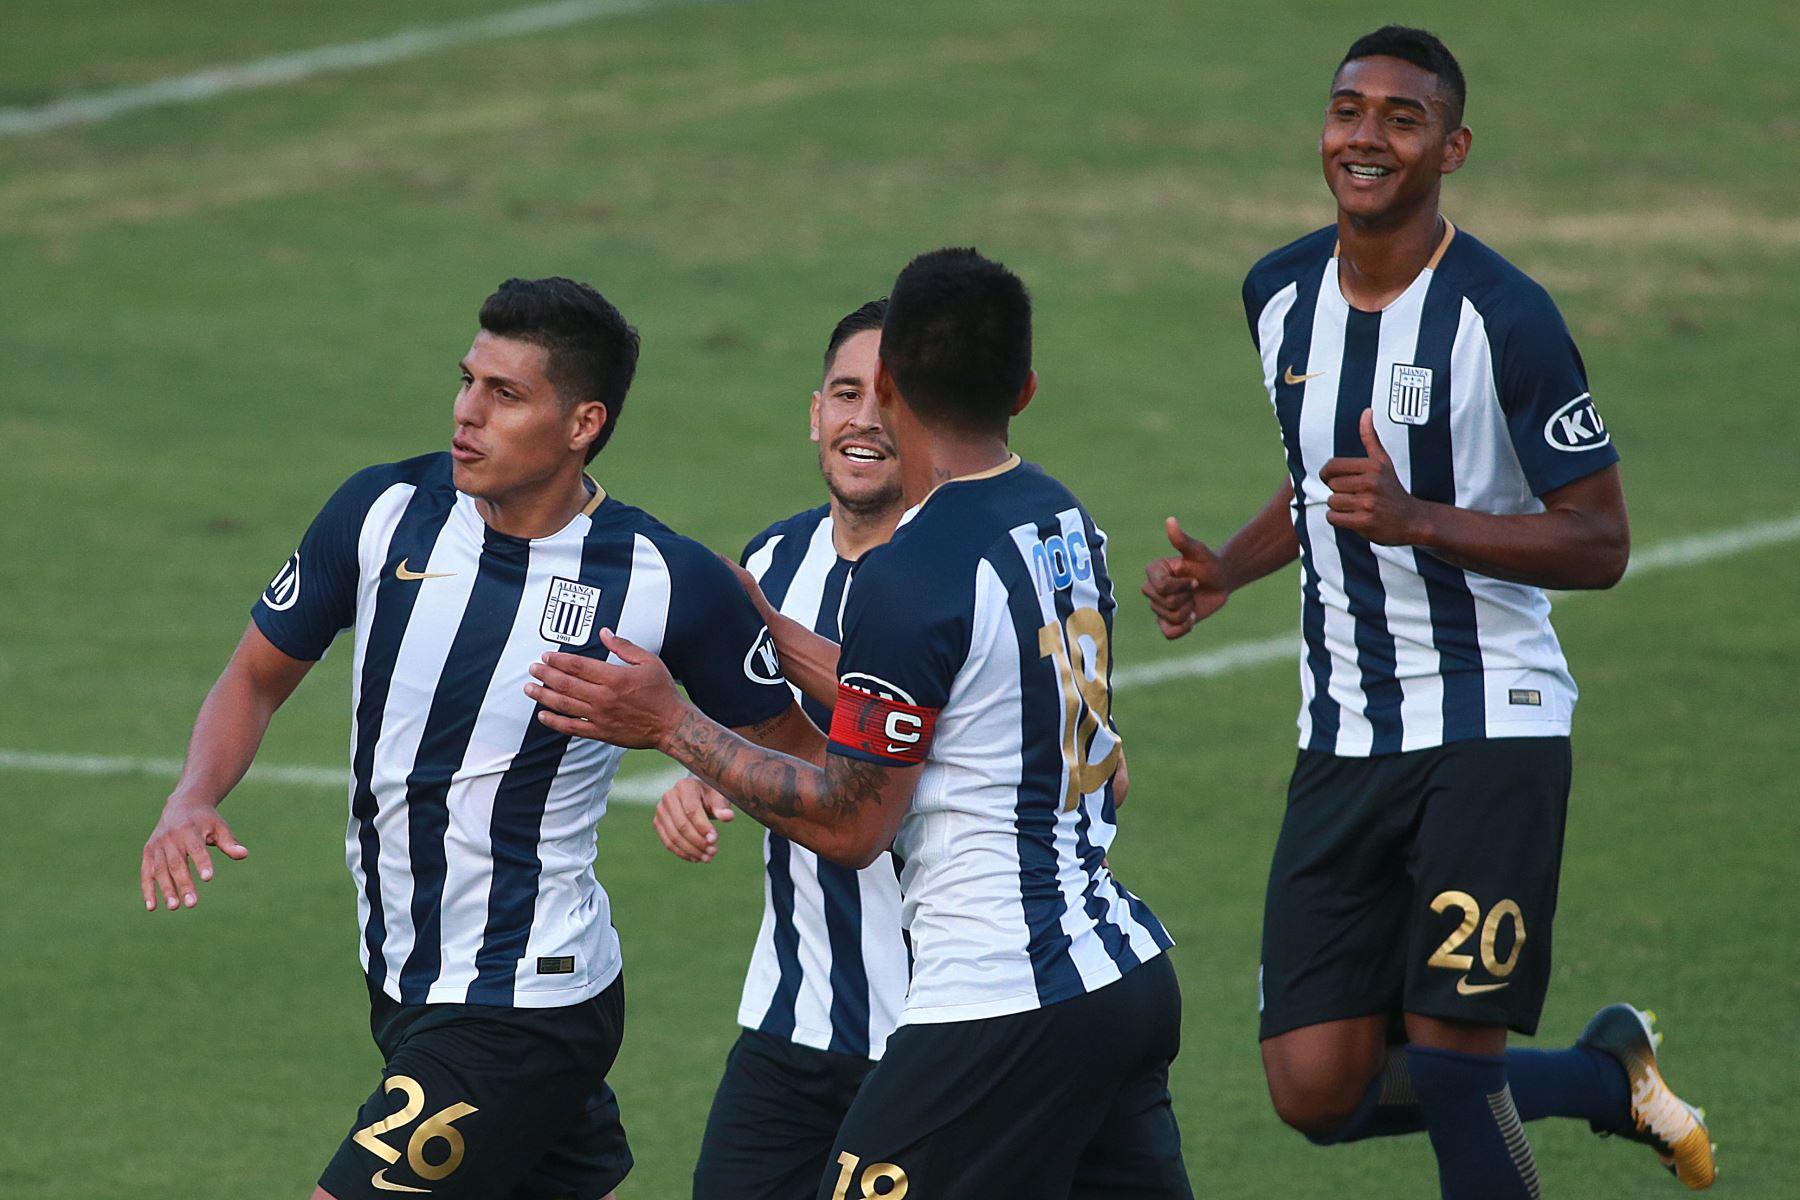 Torneo de Verano: Alianza Lima vence 3 a 1 a Sport Rosario. ANDINA/Vidal Tarqui